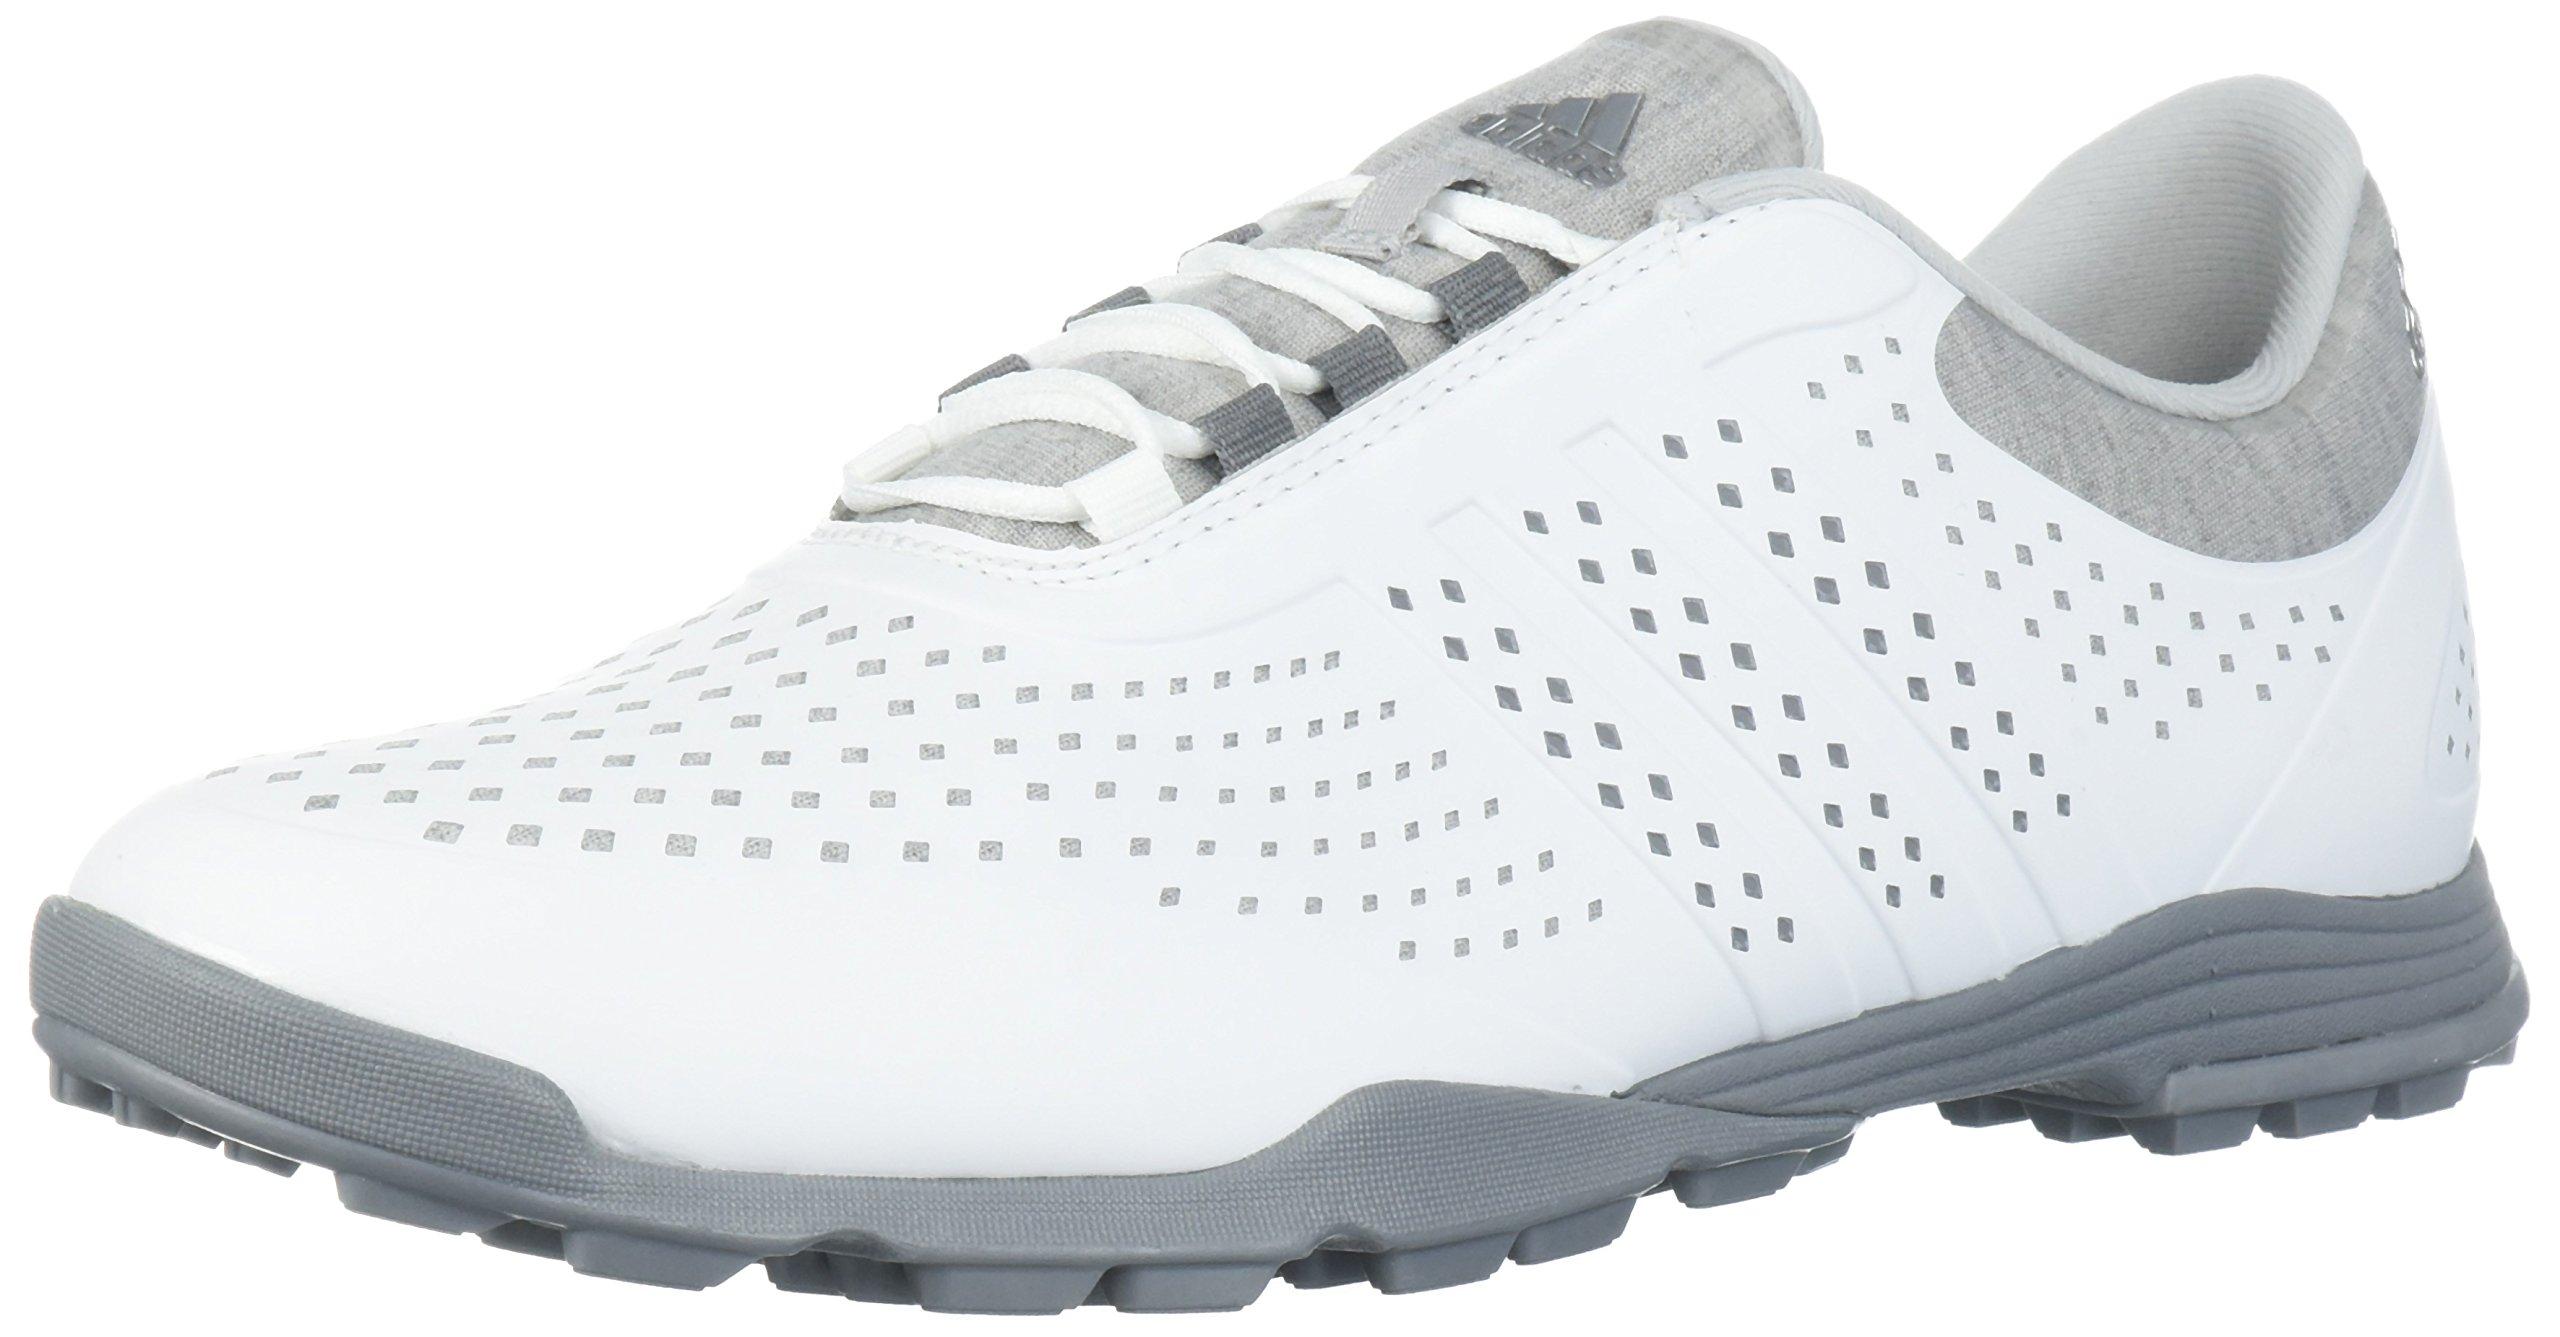 adidas Women's Adipure Sport Golf Shoe, White/Grey, 7.5 Medium US by adidas